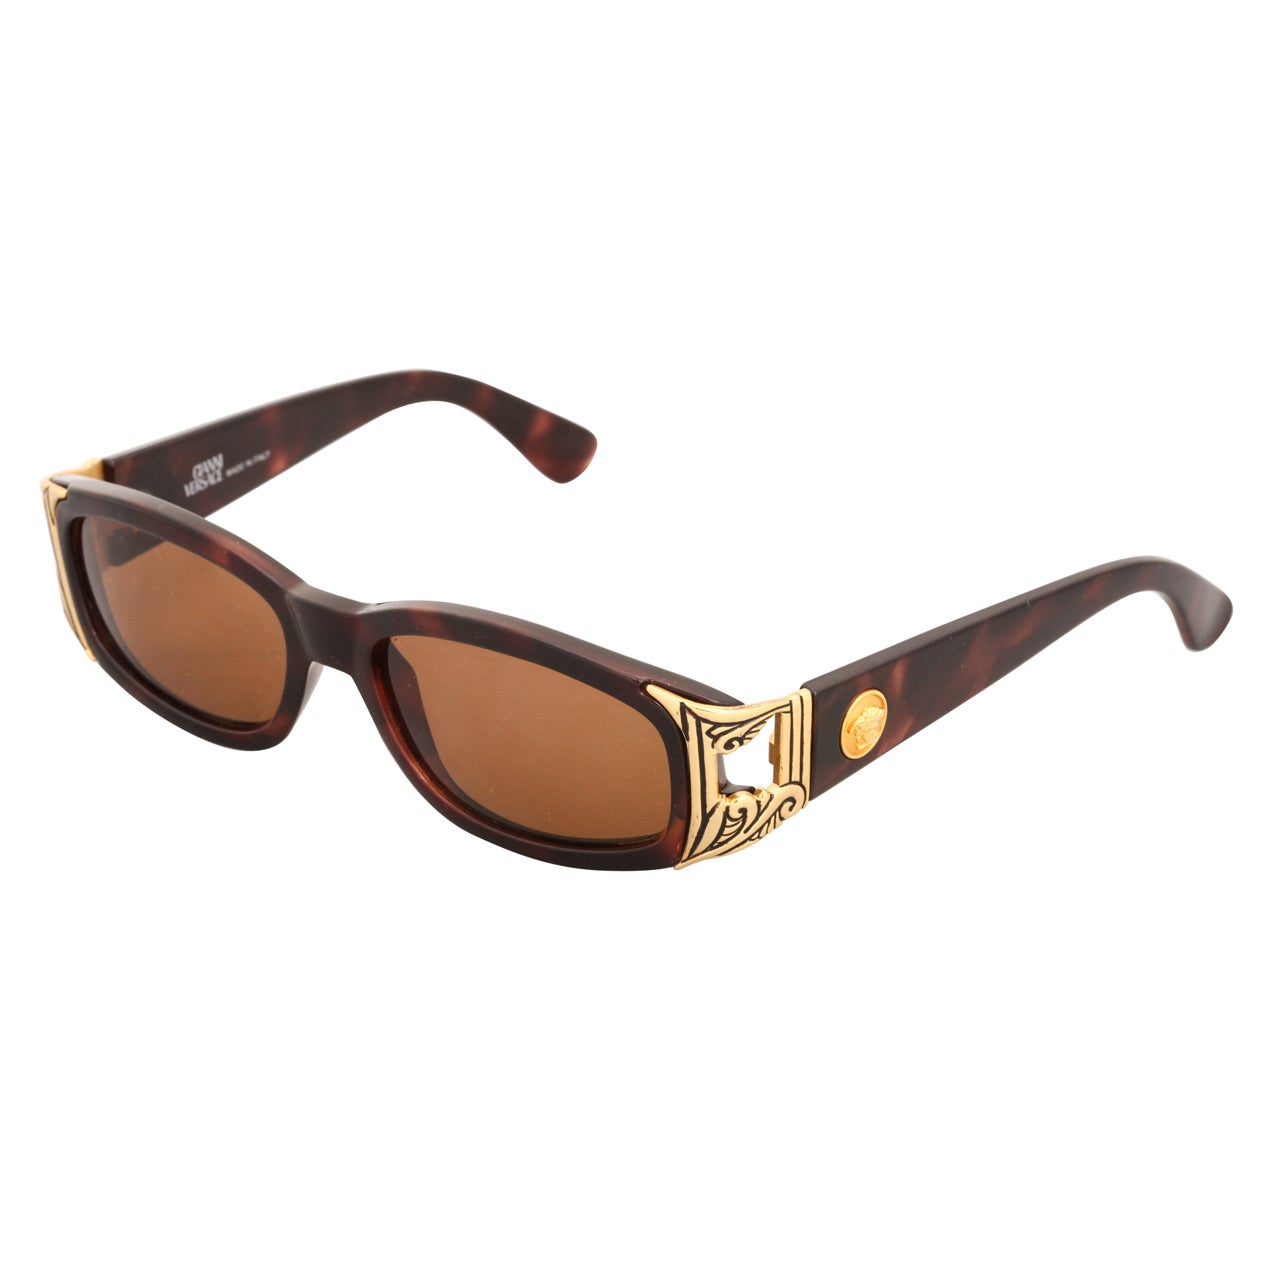 gianni versace sunglasses mod 482 col 900 at 1stdibs. Black Bedroom Furniture Sets. Home Design Ideas